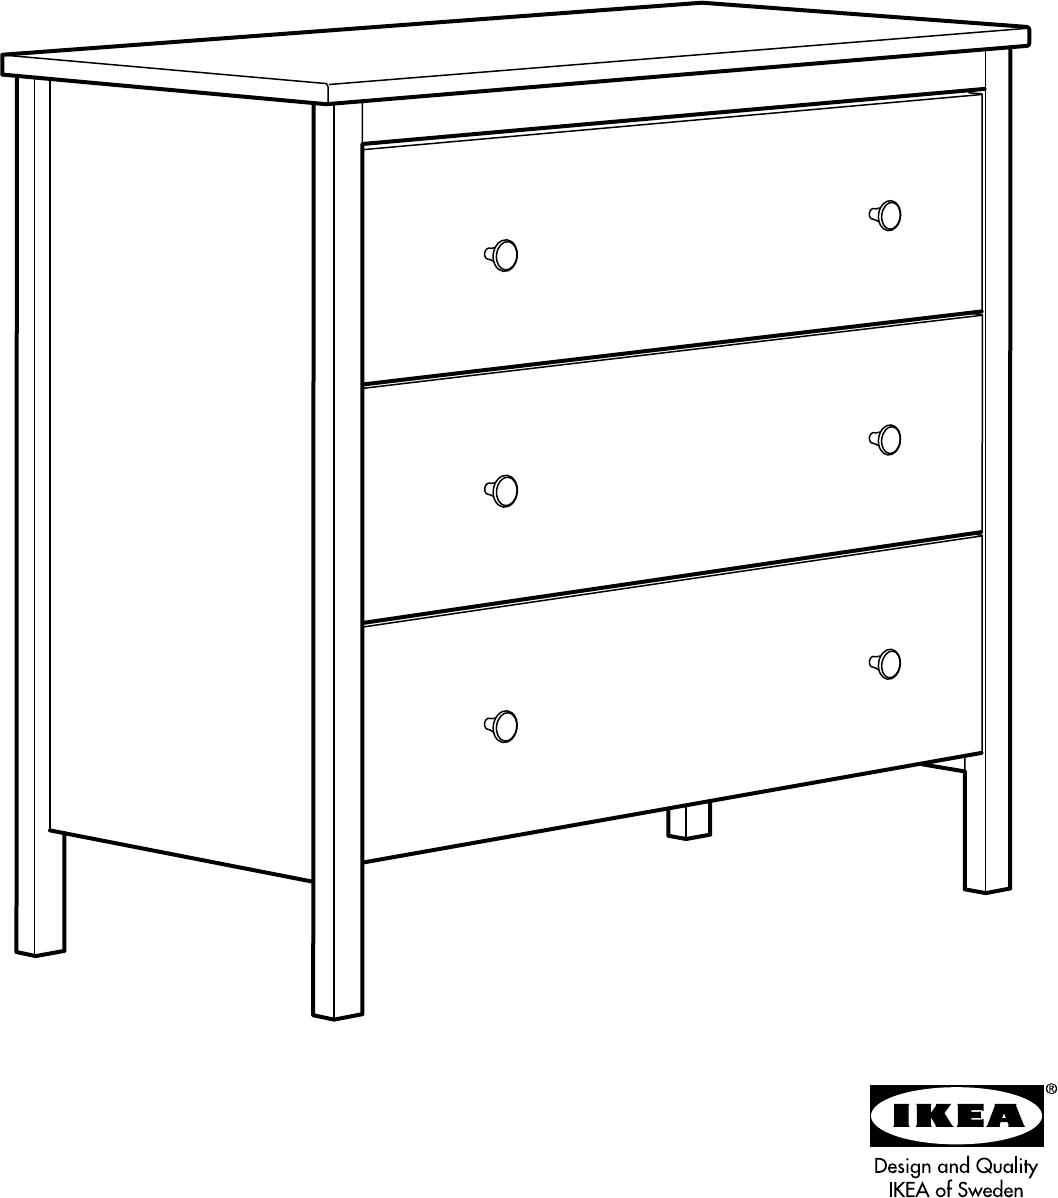 Handleiding Ikea Koppang Ladekast 3 Lades Pagina 1 Van 16